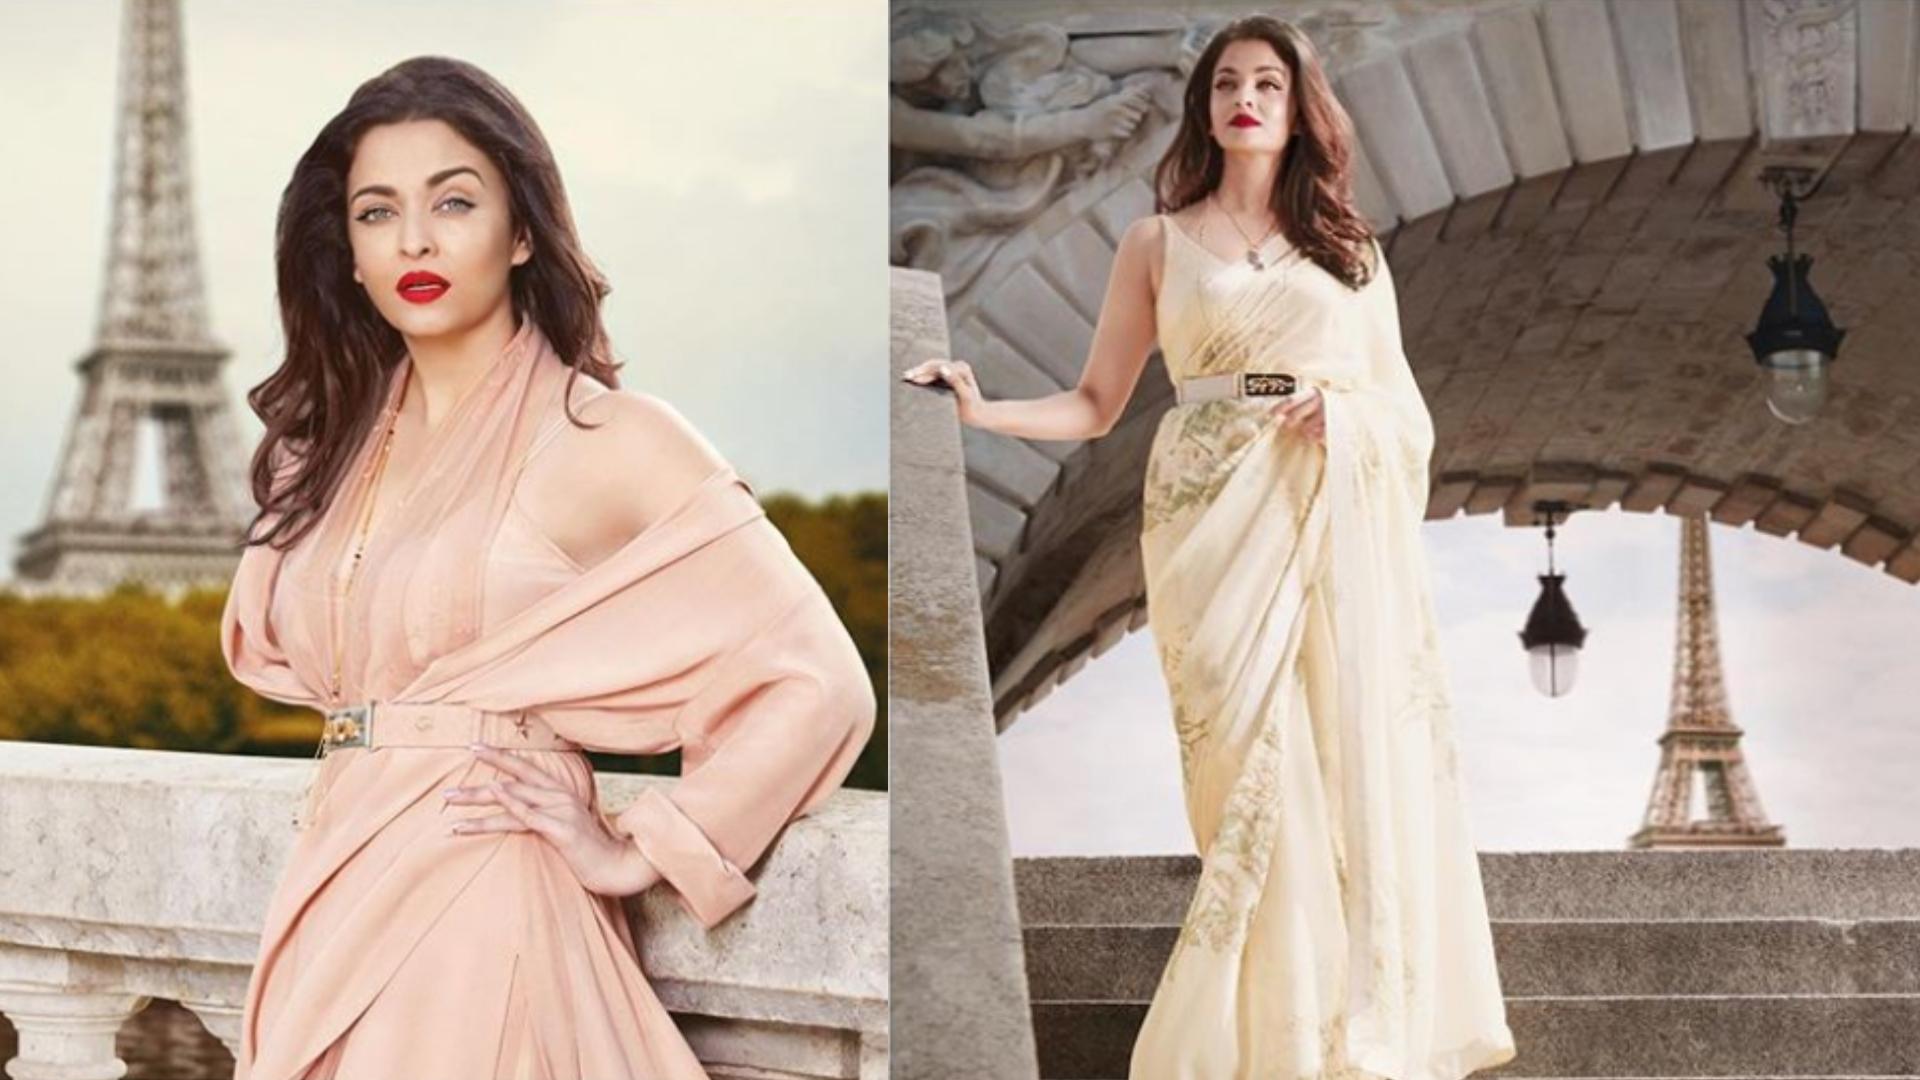 Aishwarya Rai Bachchan Spills Her Beauty Secrets